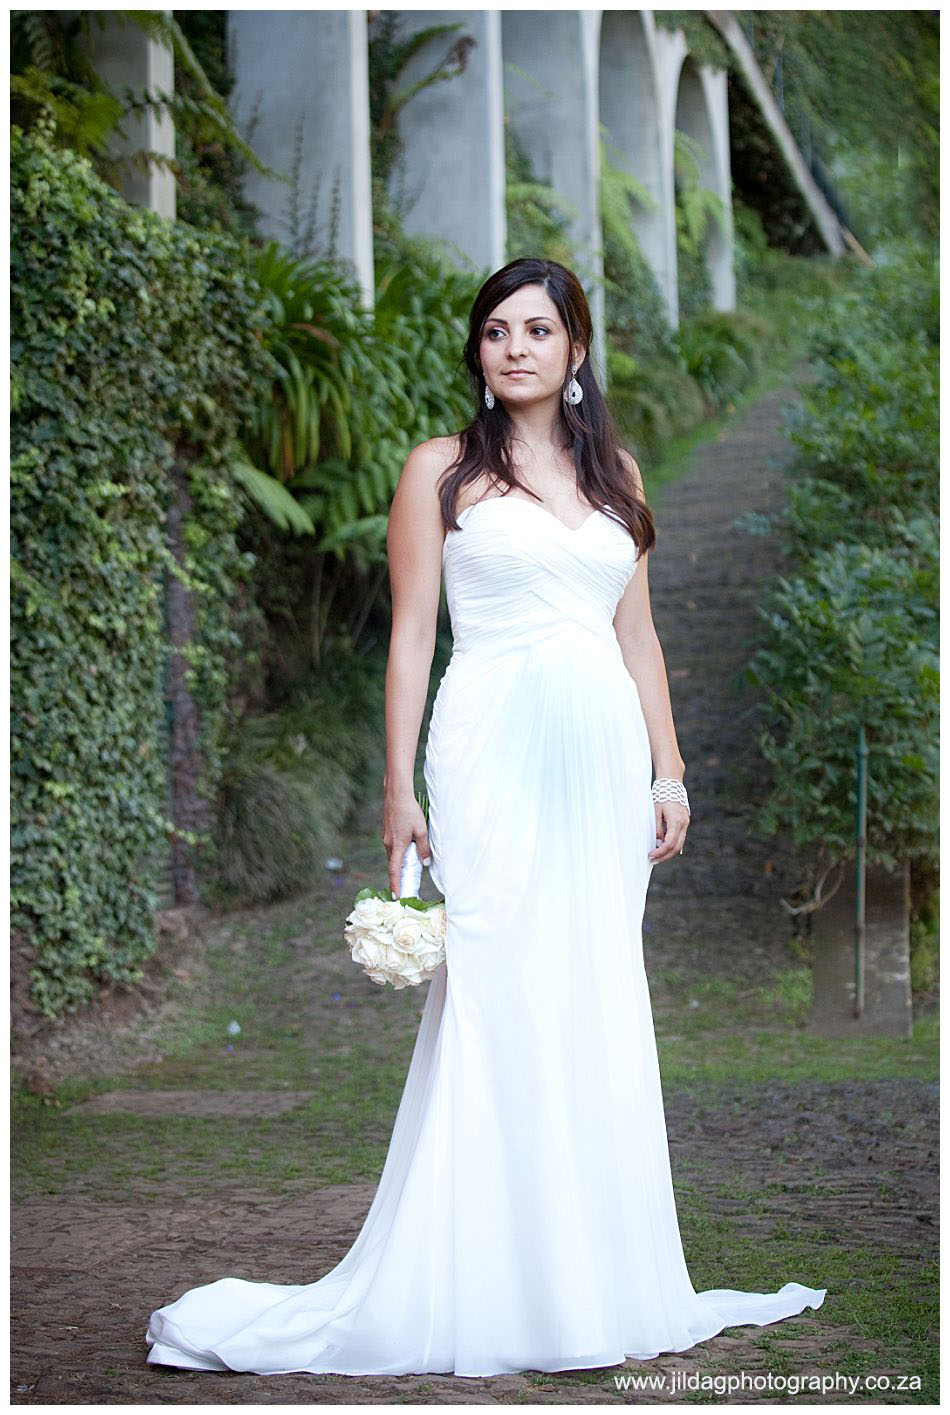 Destination wedding, Madeira Portugal wedding, Monica & Helder (20)